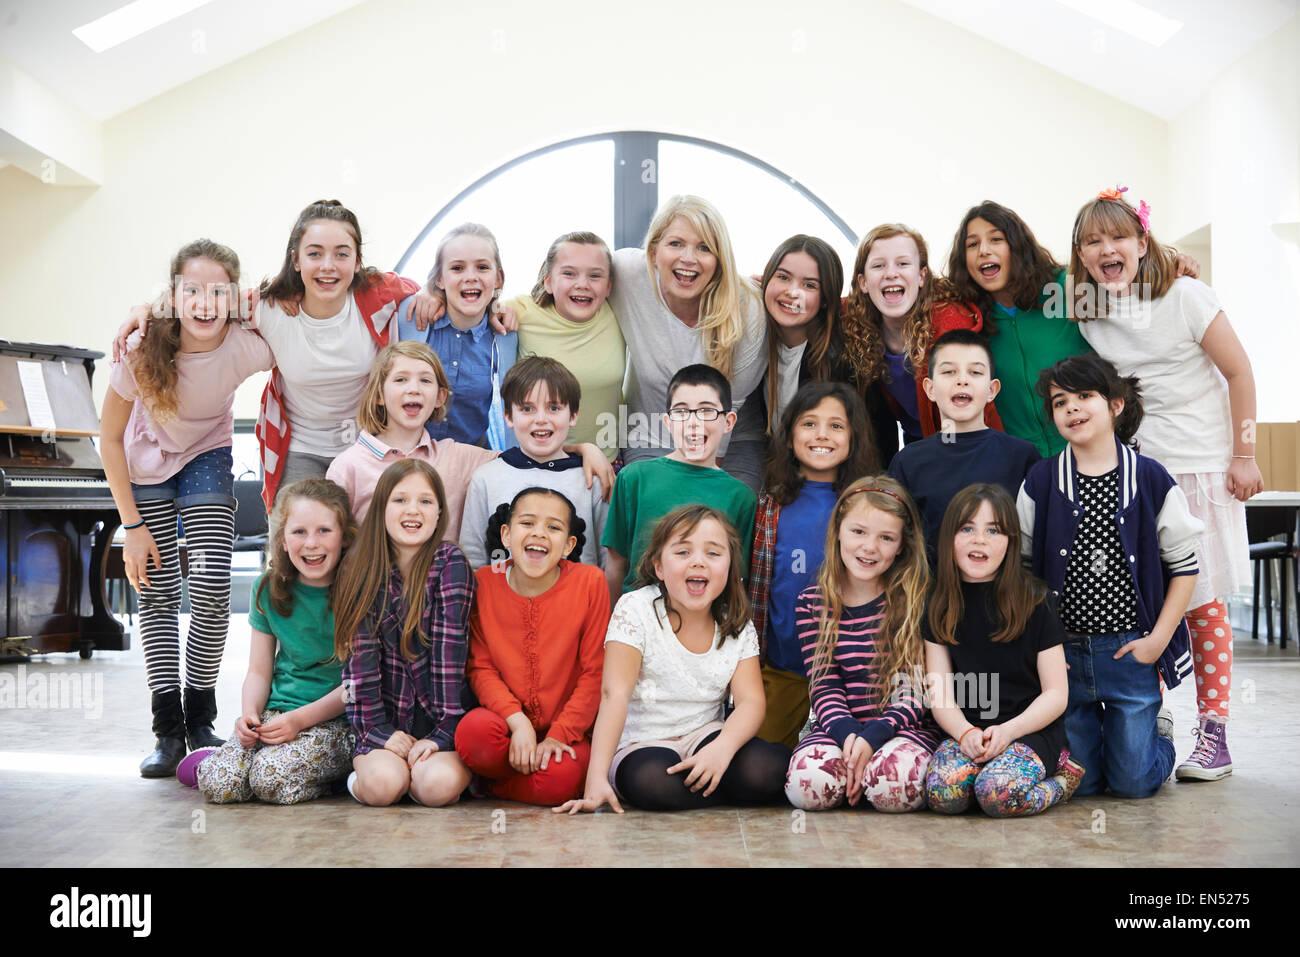 Large Group Of Children With Teacher Enjoying Drama Workshop Together - Stock Image